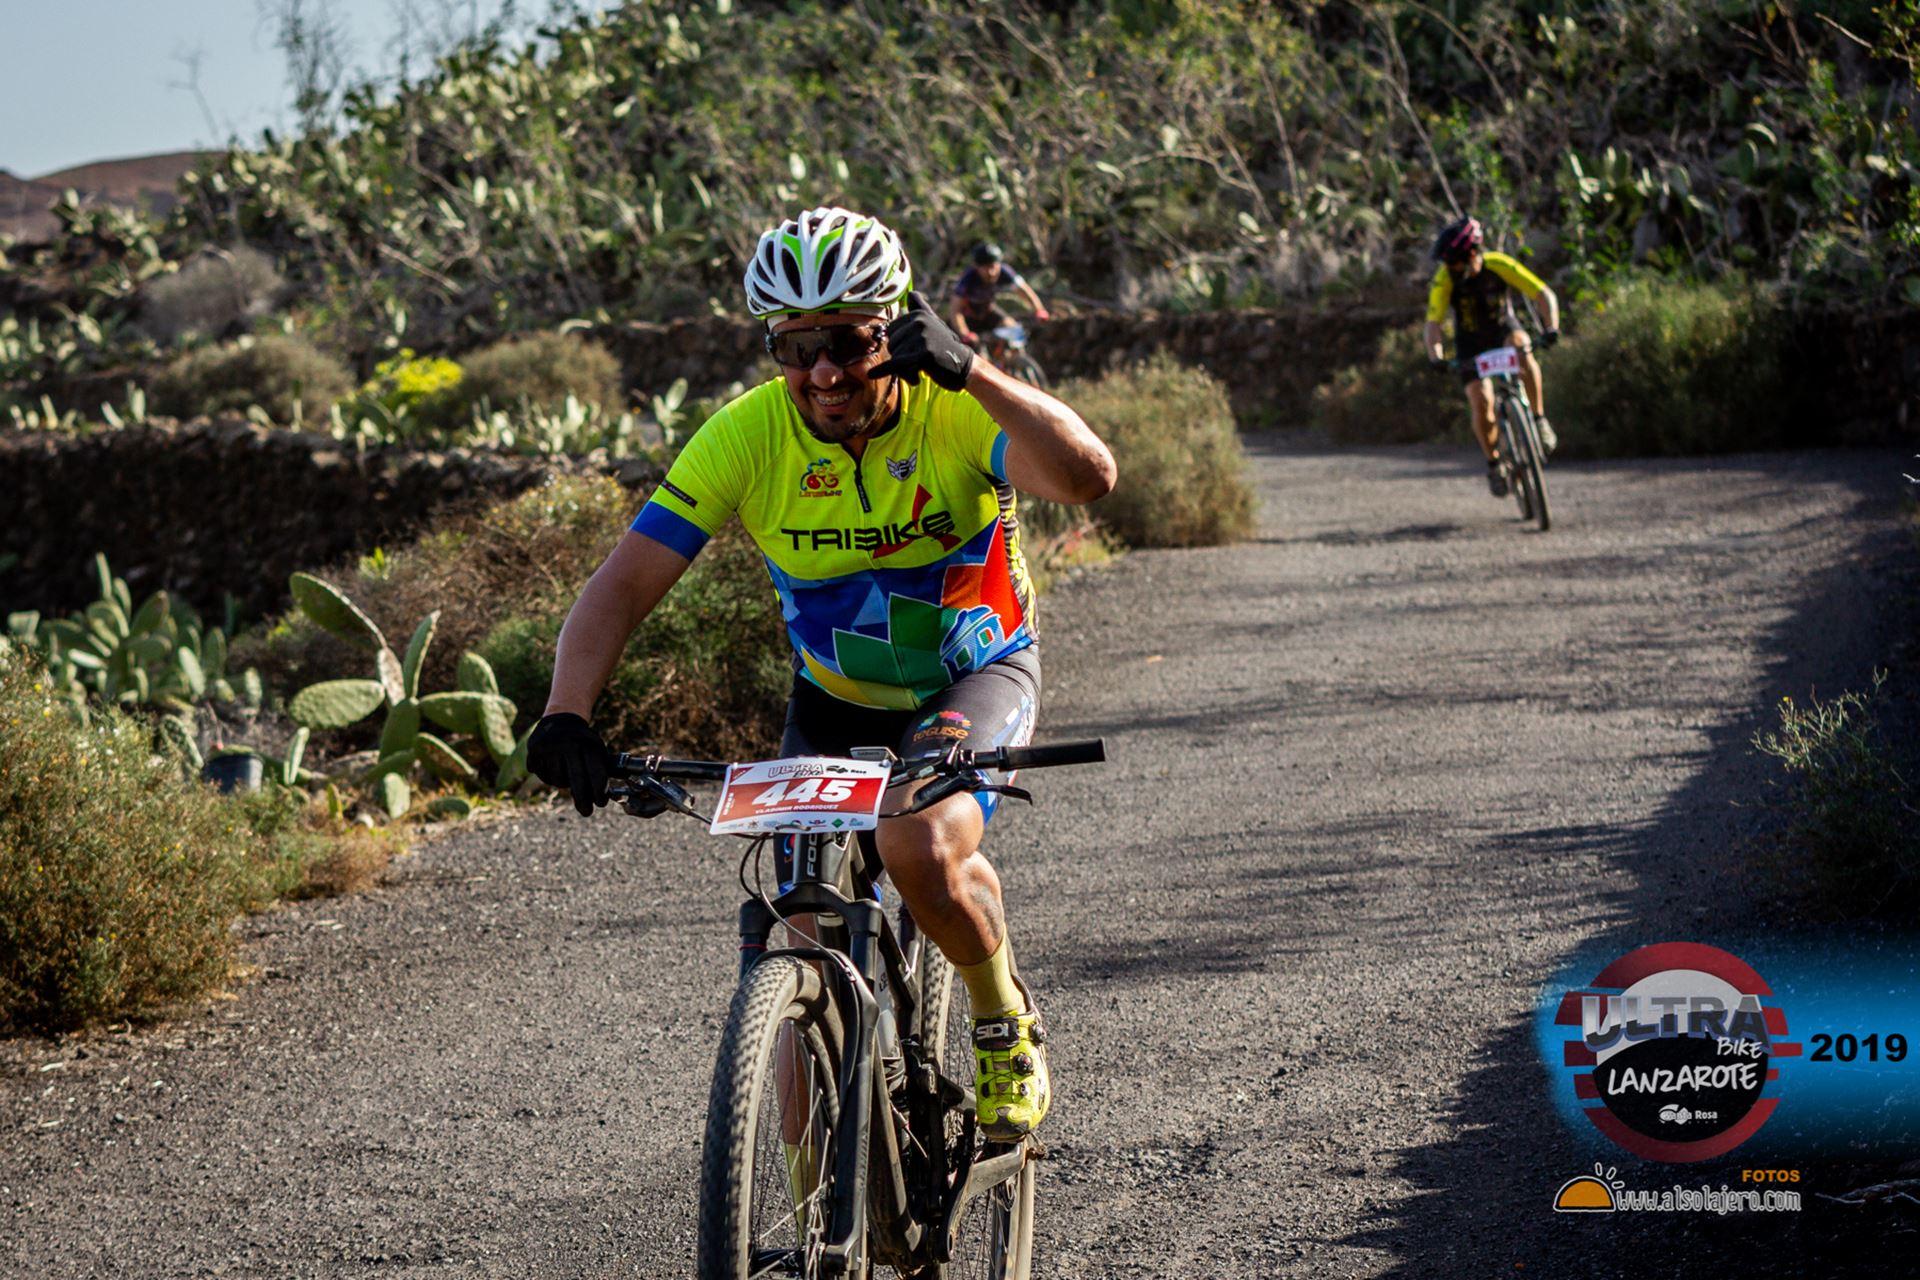 Sector Guatiza 2ª Etapa Ultrabike 2019 Fotos Alsolajero.com-145